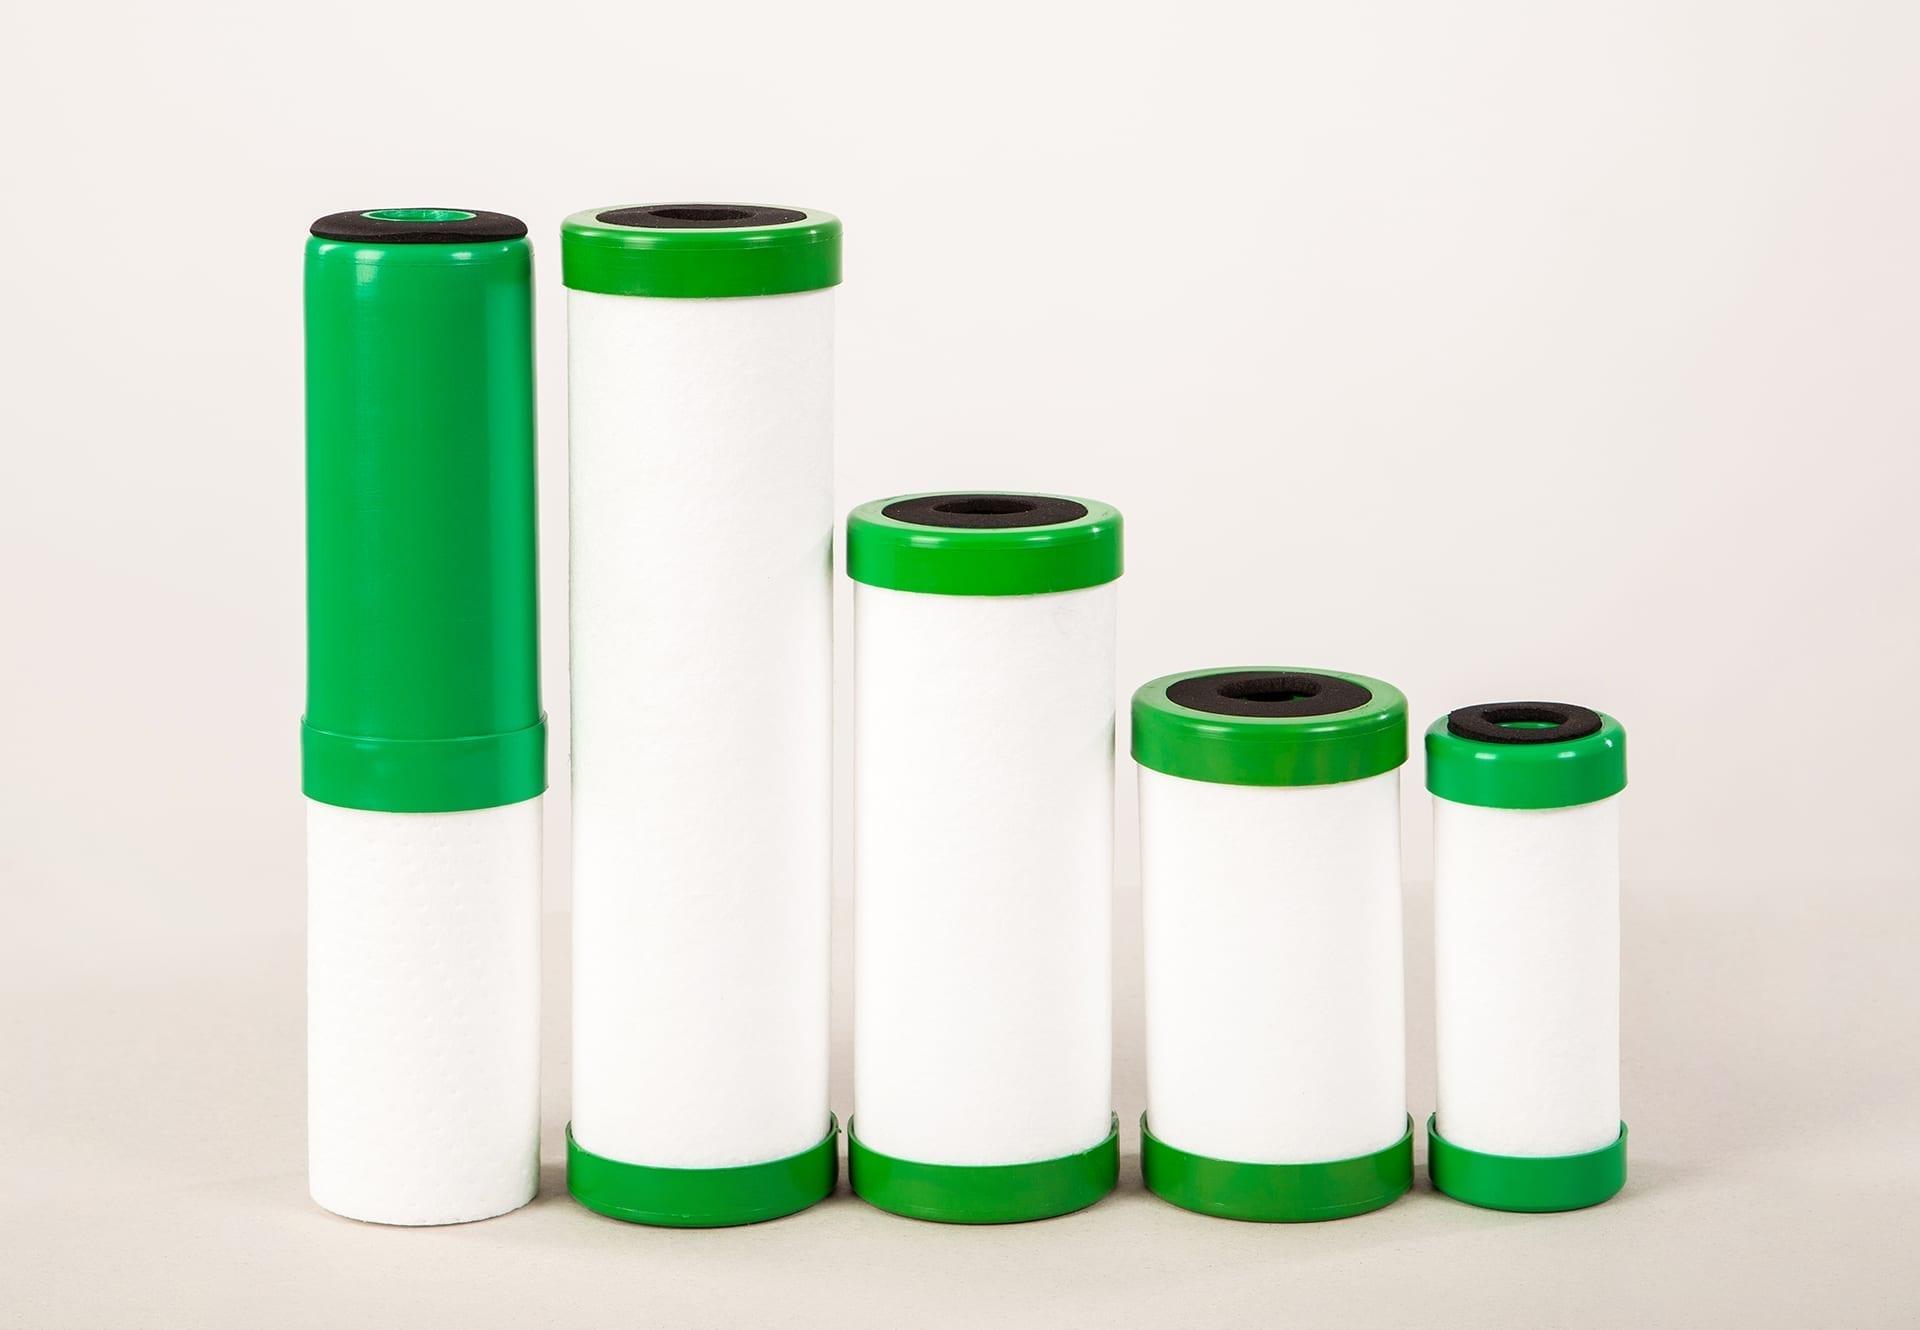 Ūdens filtri kombinētie 10 MK CA AG ''ZAĻŠ''